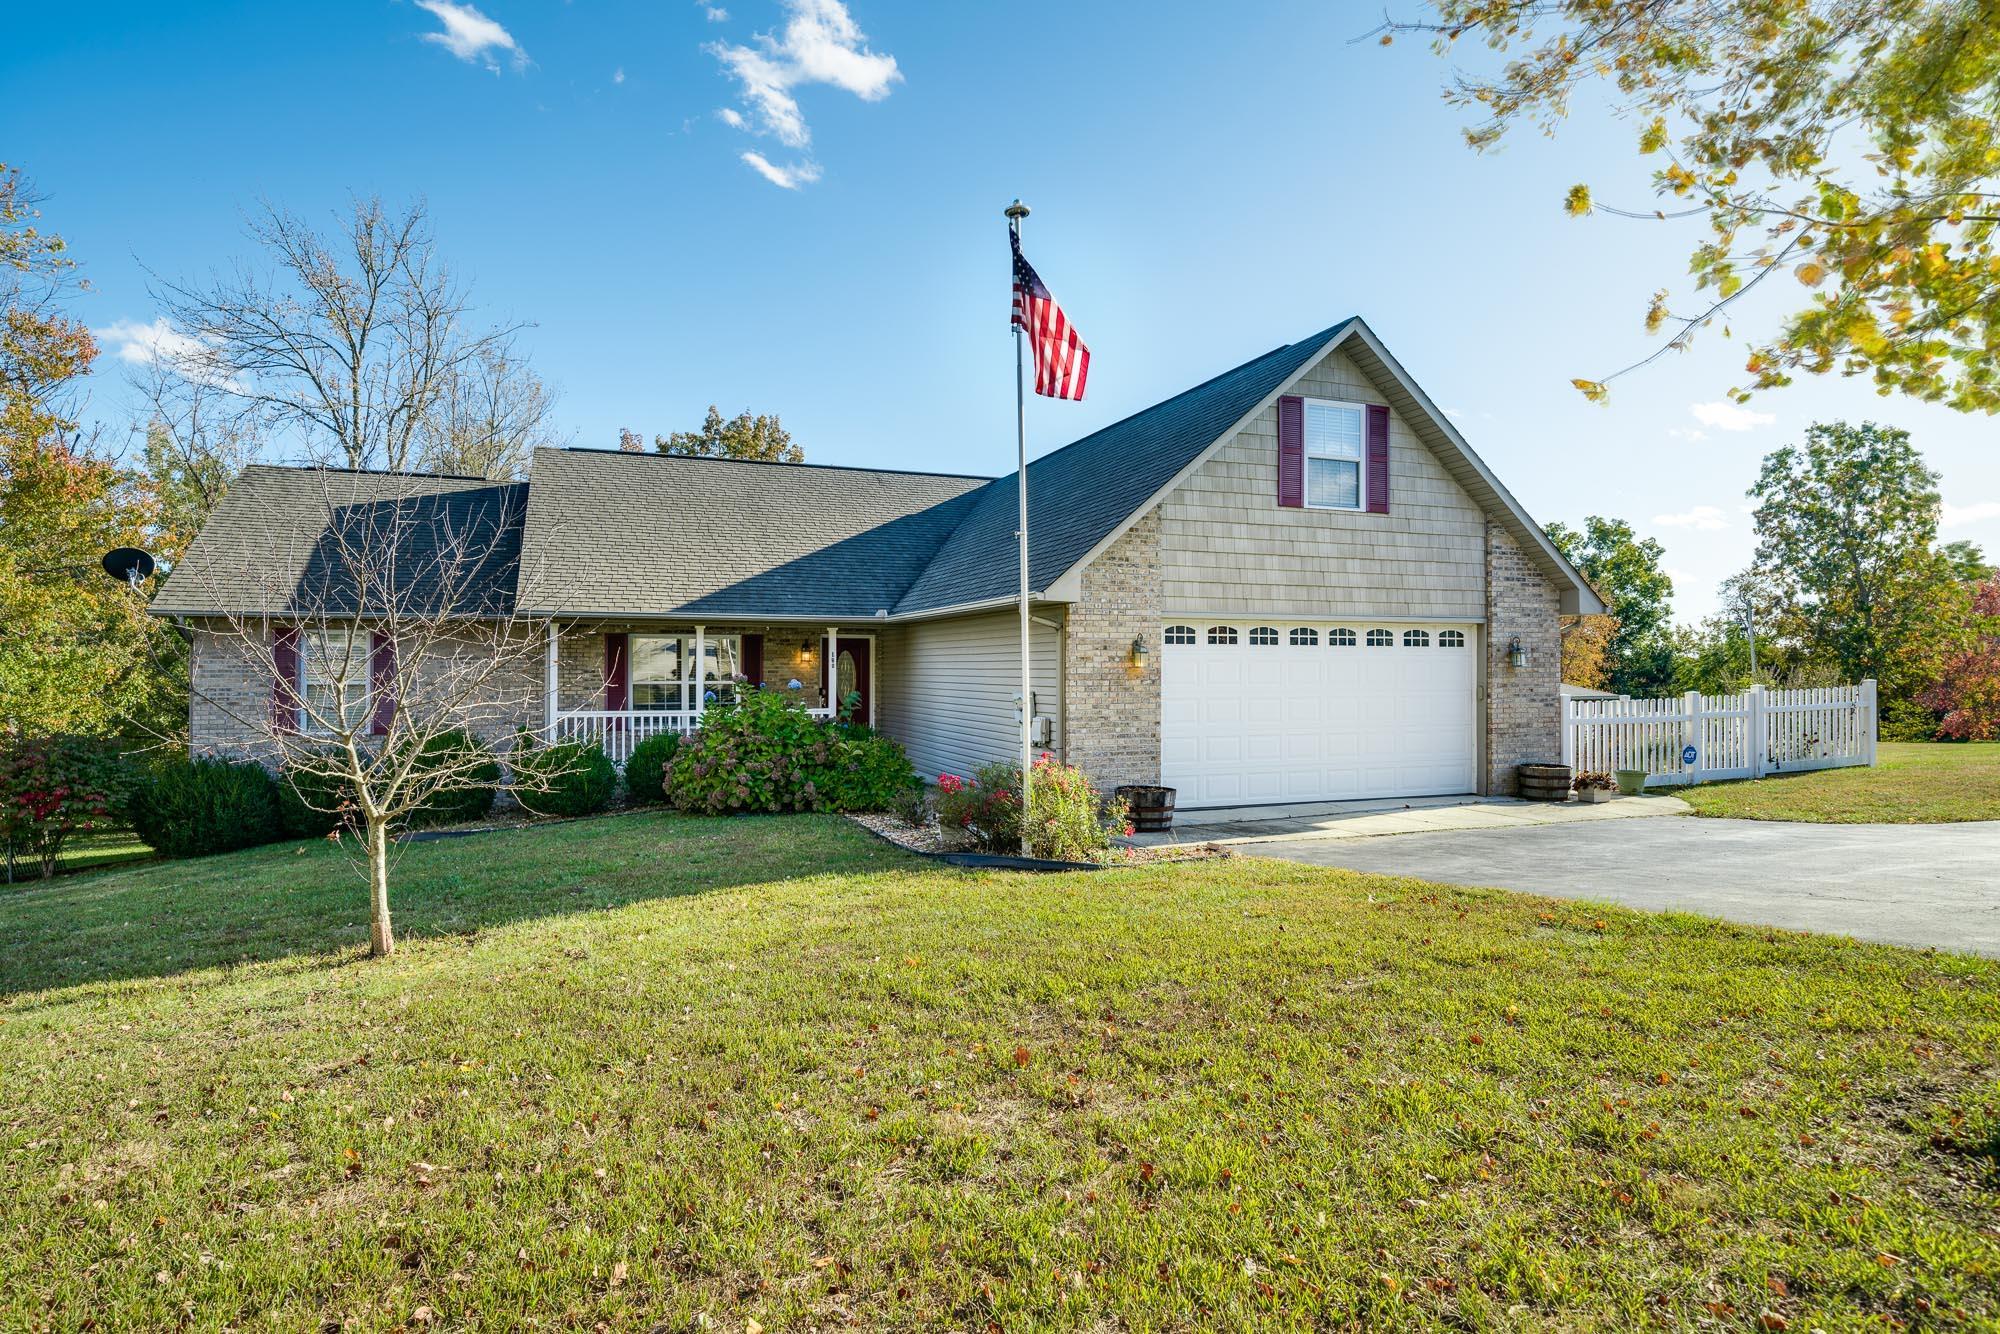 159 Waterview Dr, Crossville, TN 38555 - Crossville, TN real estate listing